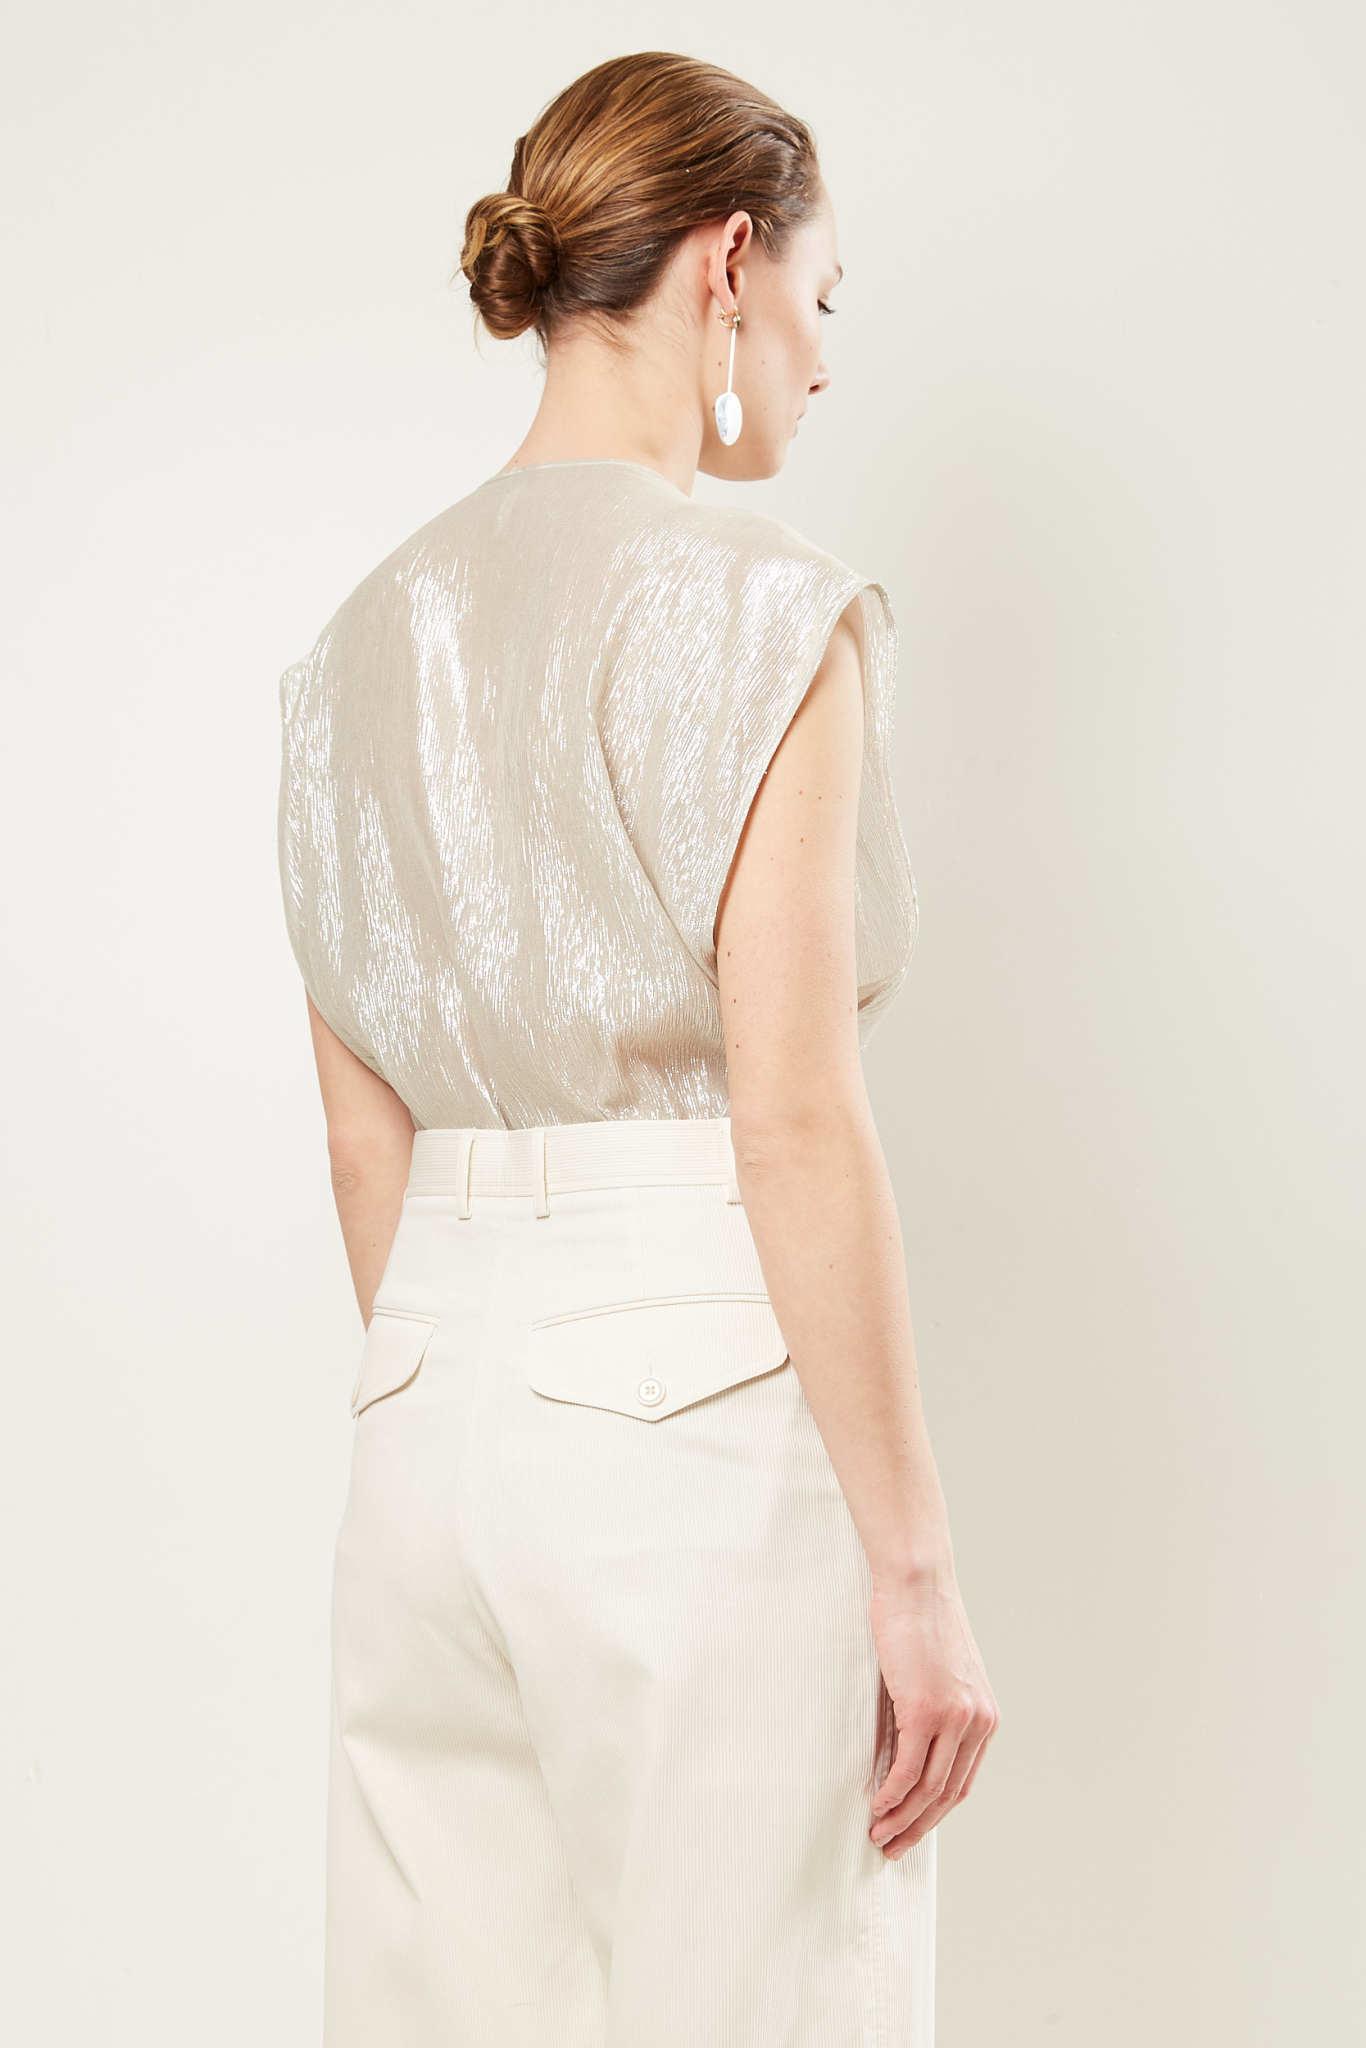 inDRESS - sparkling silk body